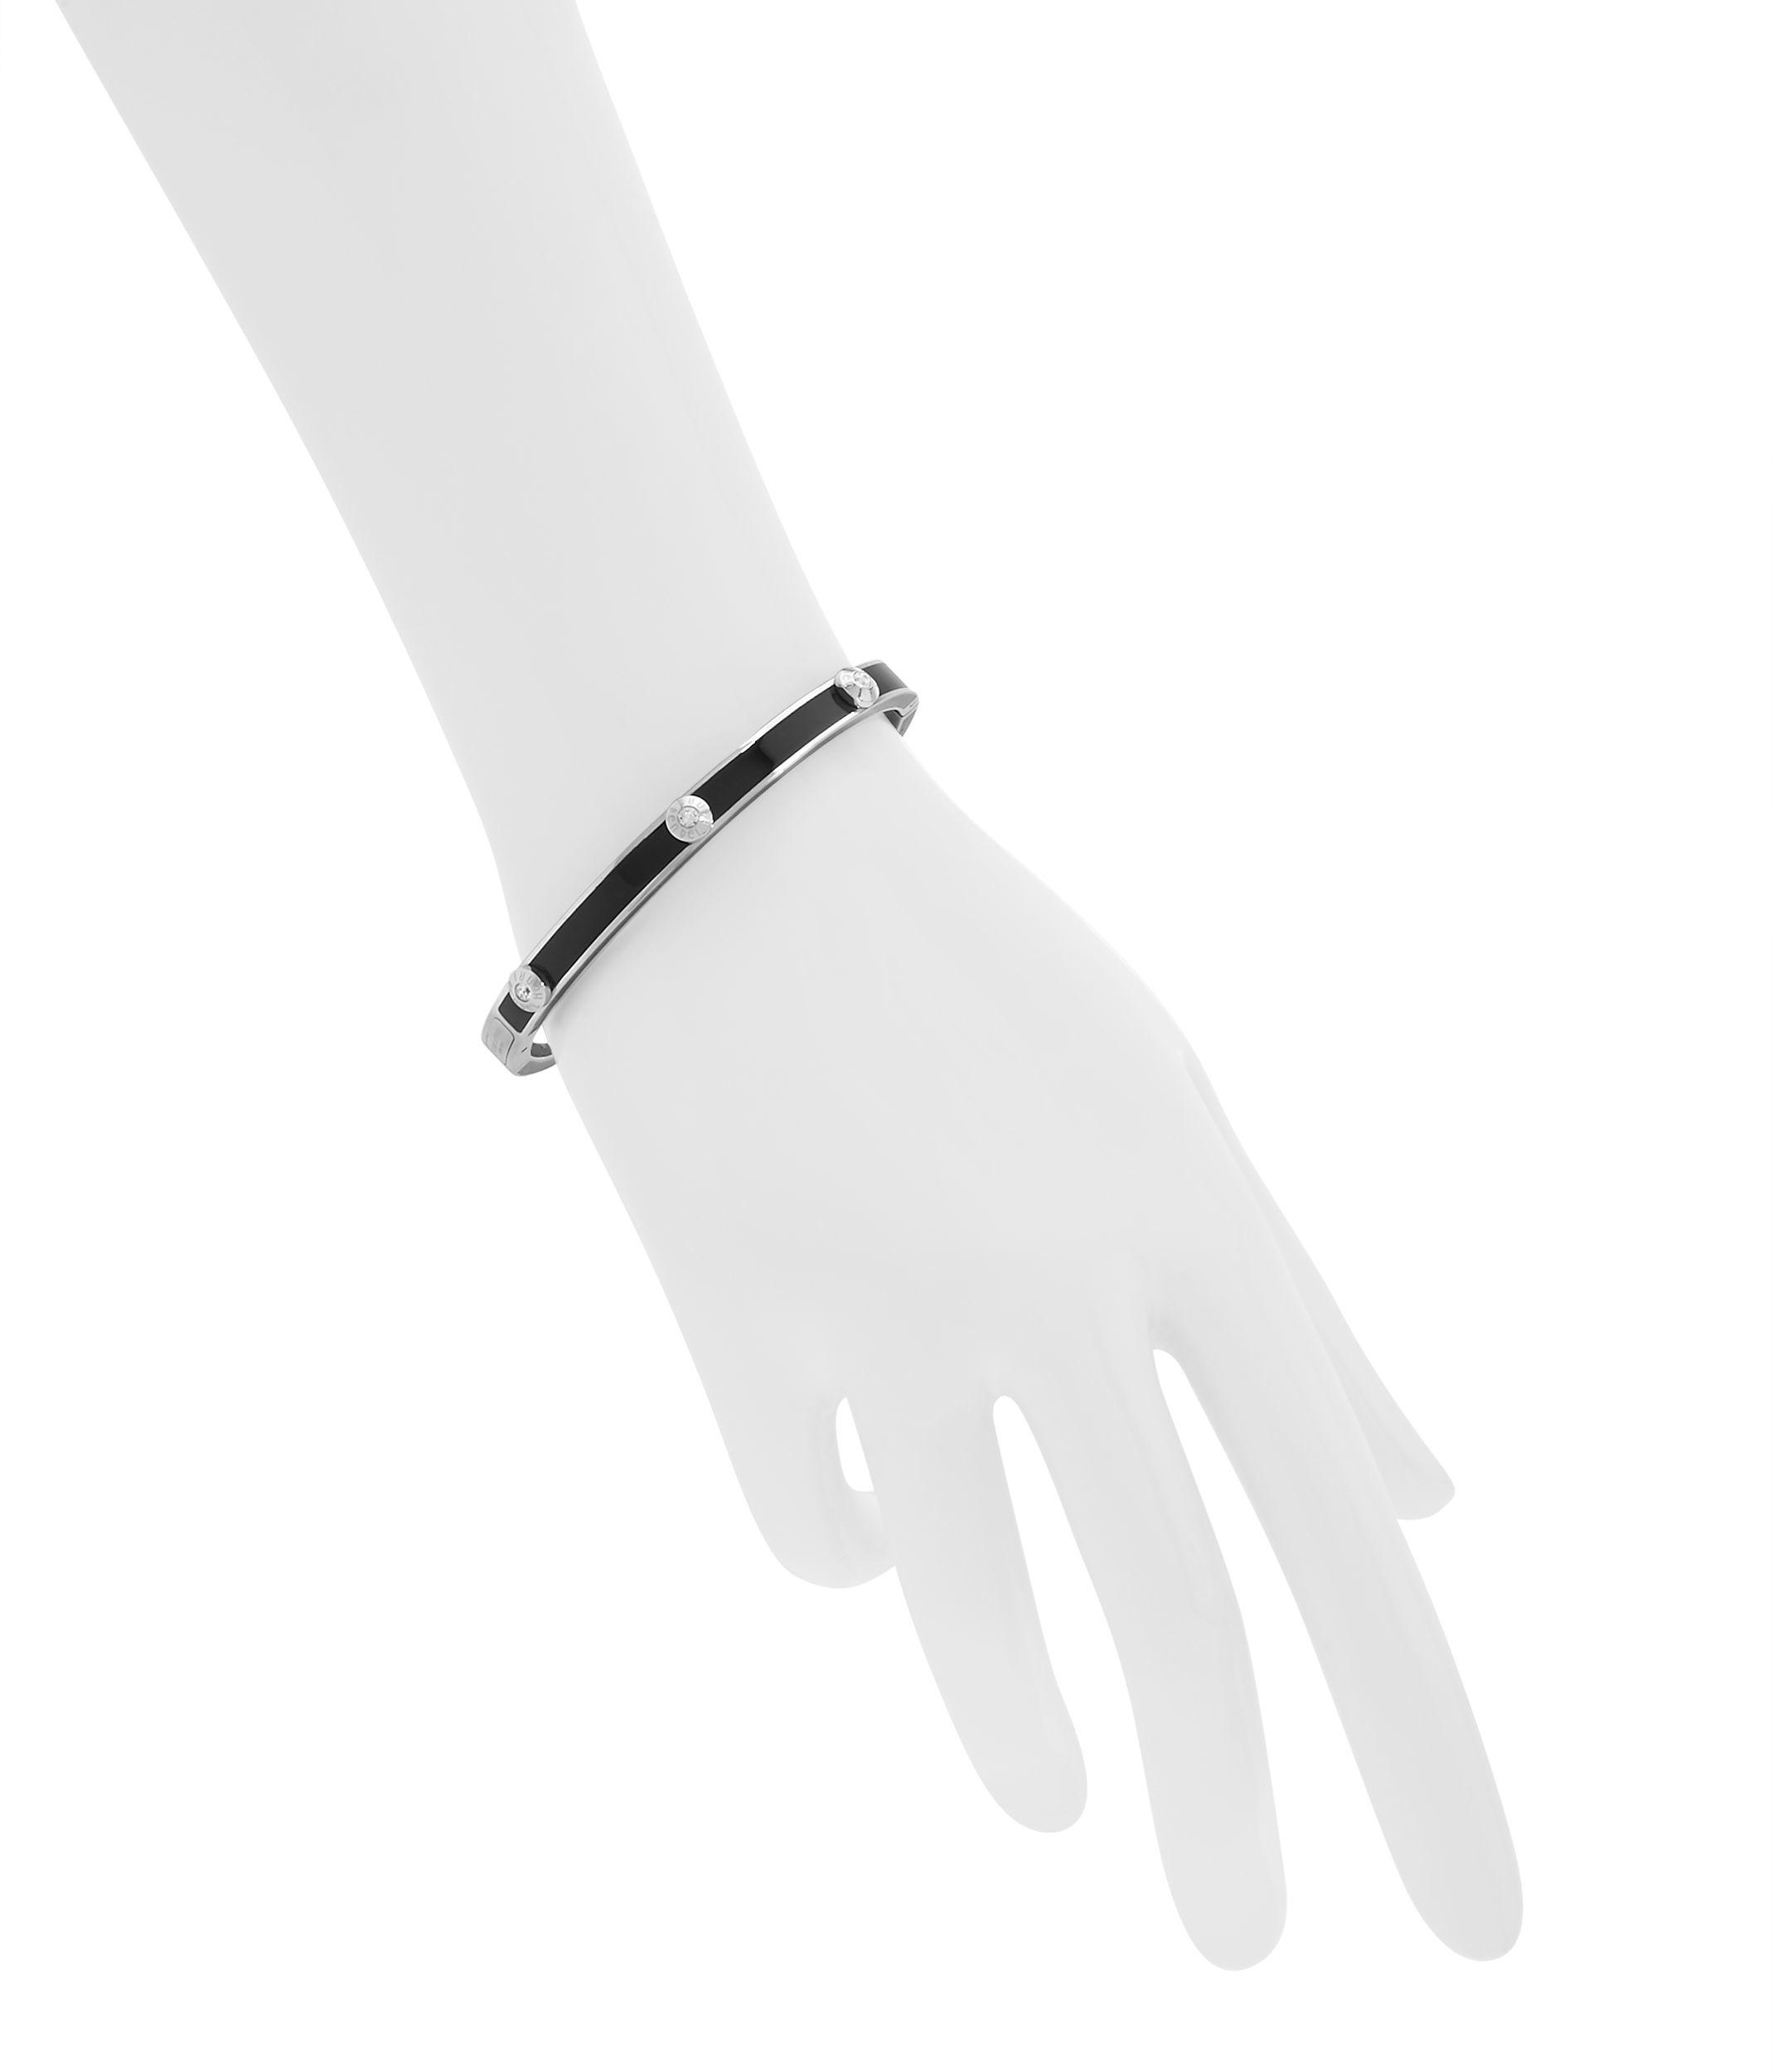 Lyst Henri Bendel Miss Bendel Rivet Bangle Bracelet In Black